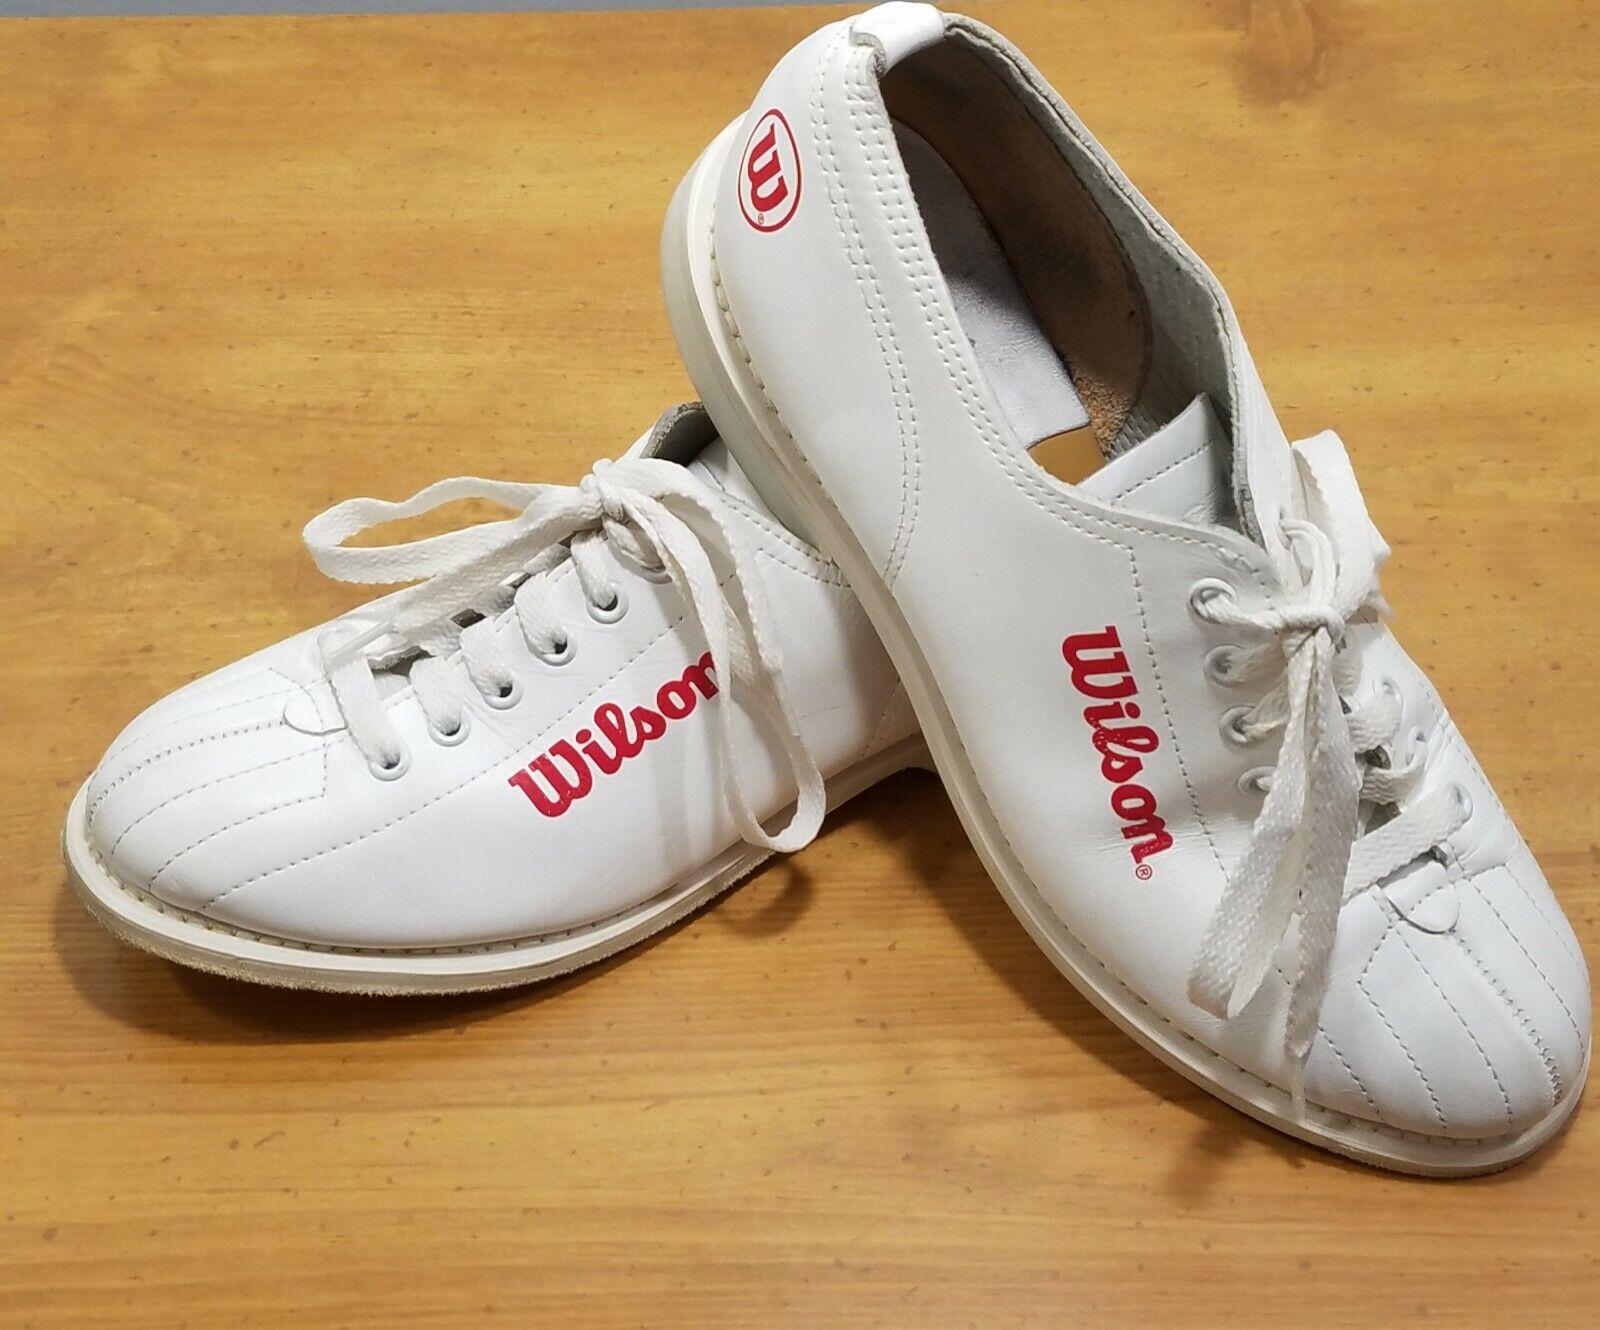 Wilson Bowling shoes Womens 6.5 Vintage Retro White Split Toe W21852182